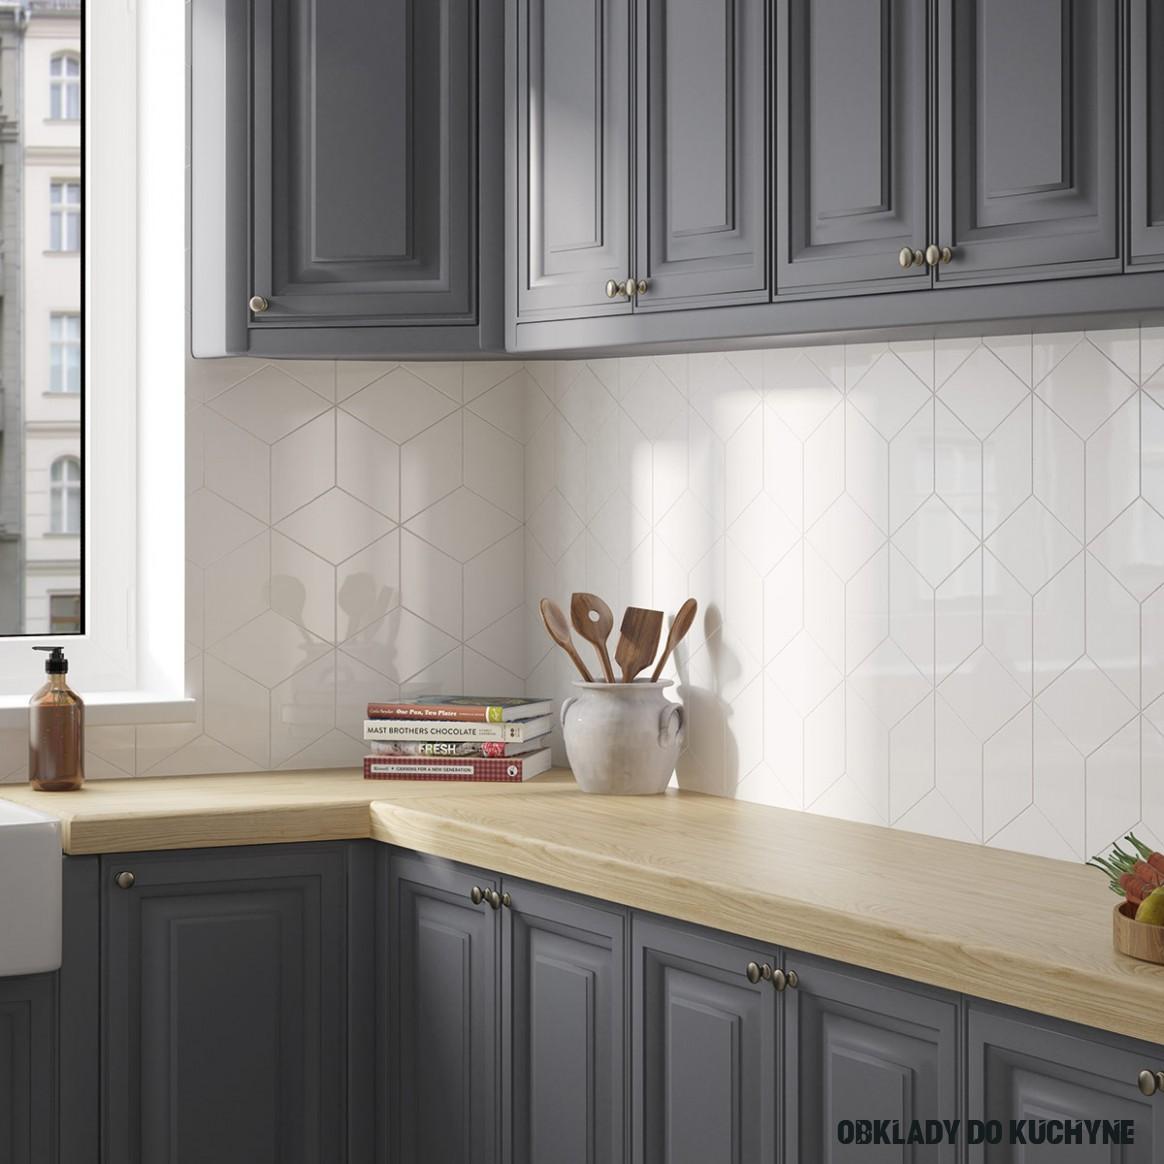 EQUIPE RHOMBUS 11,11x116,11 cm obklad do kuchyne a do kúpeľne -11%